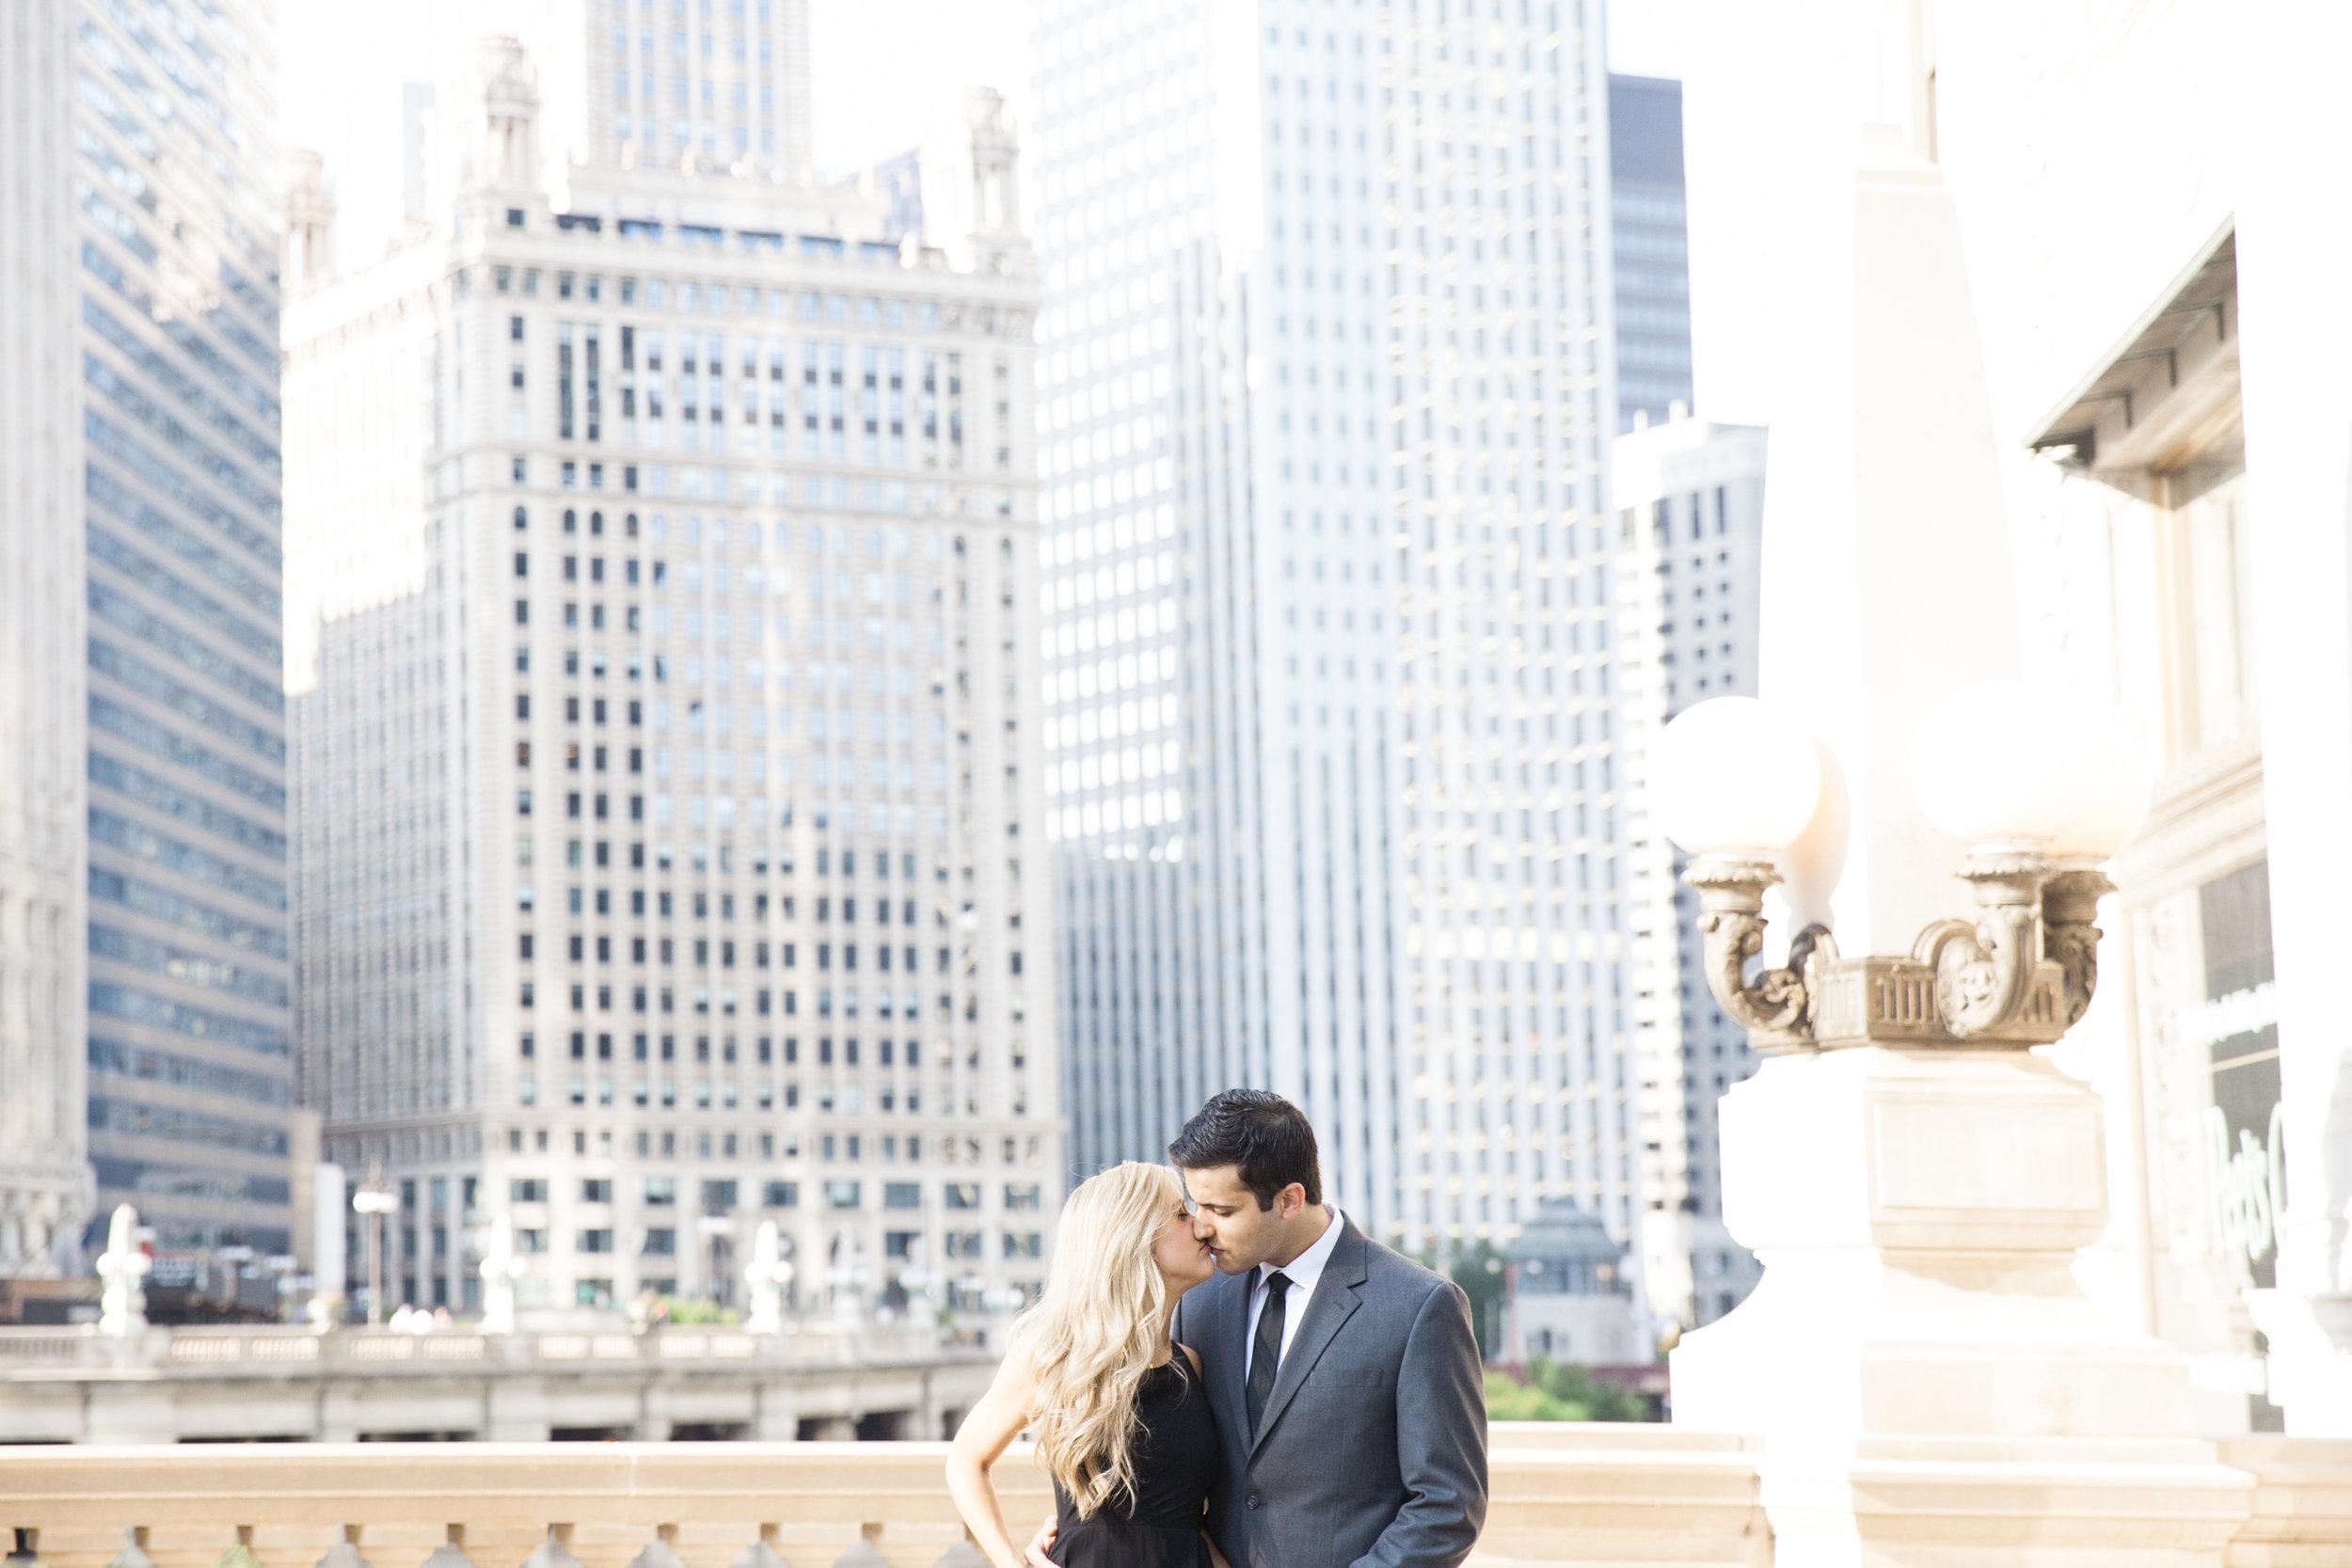 LisaDiederichPhotography_Landon&Ramsey_ChicagoEngagement-26.jpg